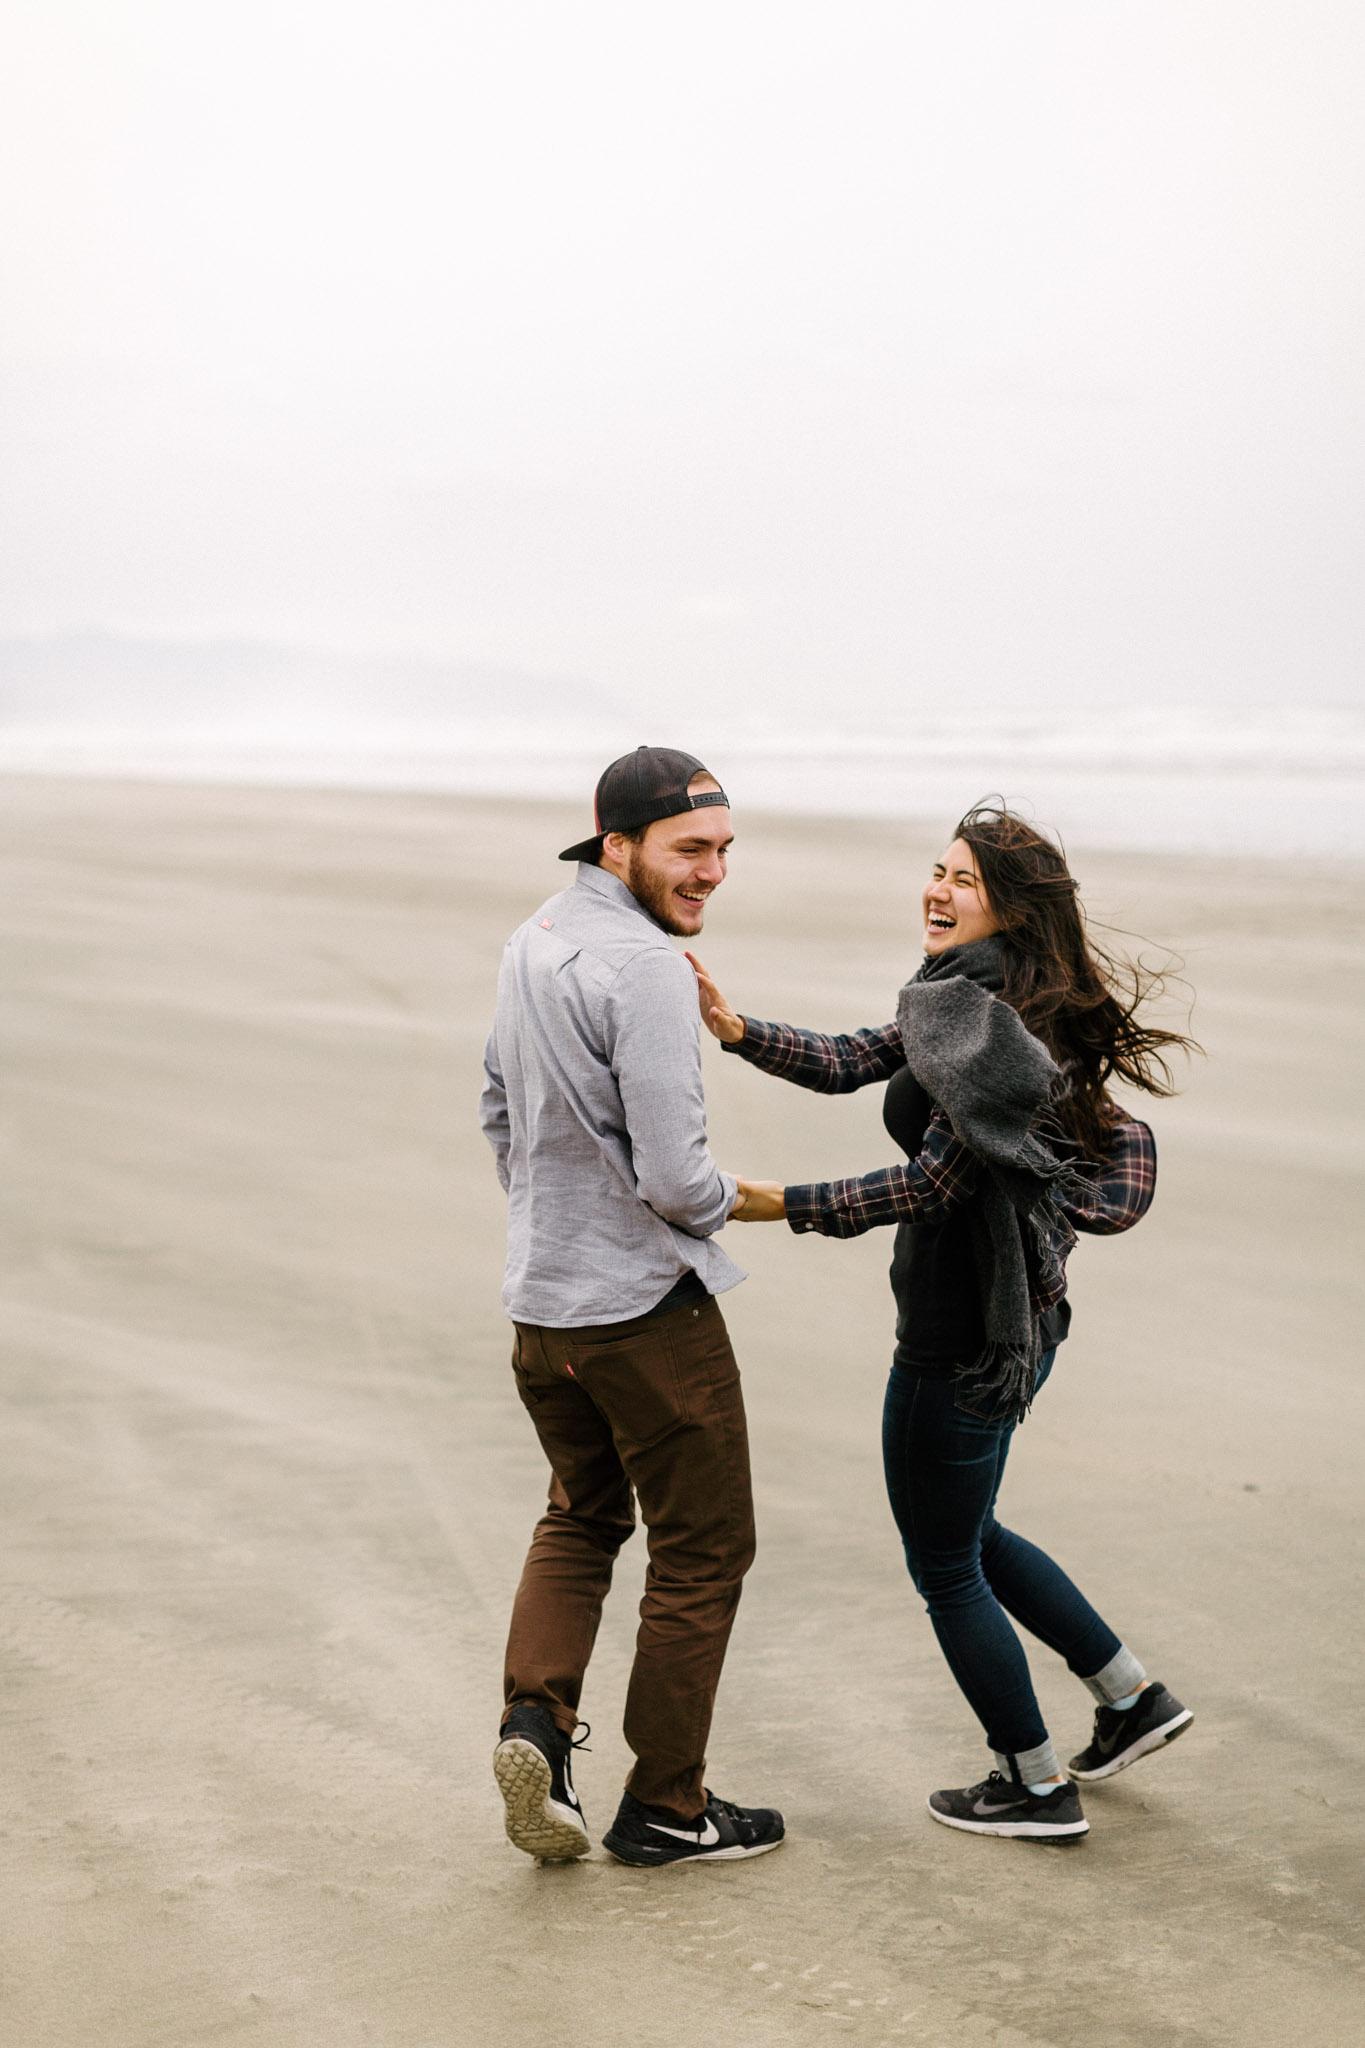 Oregon-Cape-Kiwanda-Engagement-Pia-Anna-Christian-Wedding-Photography-PNW-CJ-8.jpg